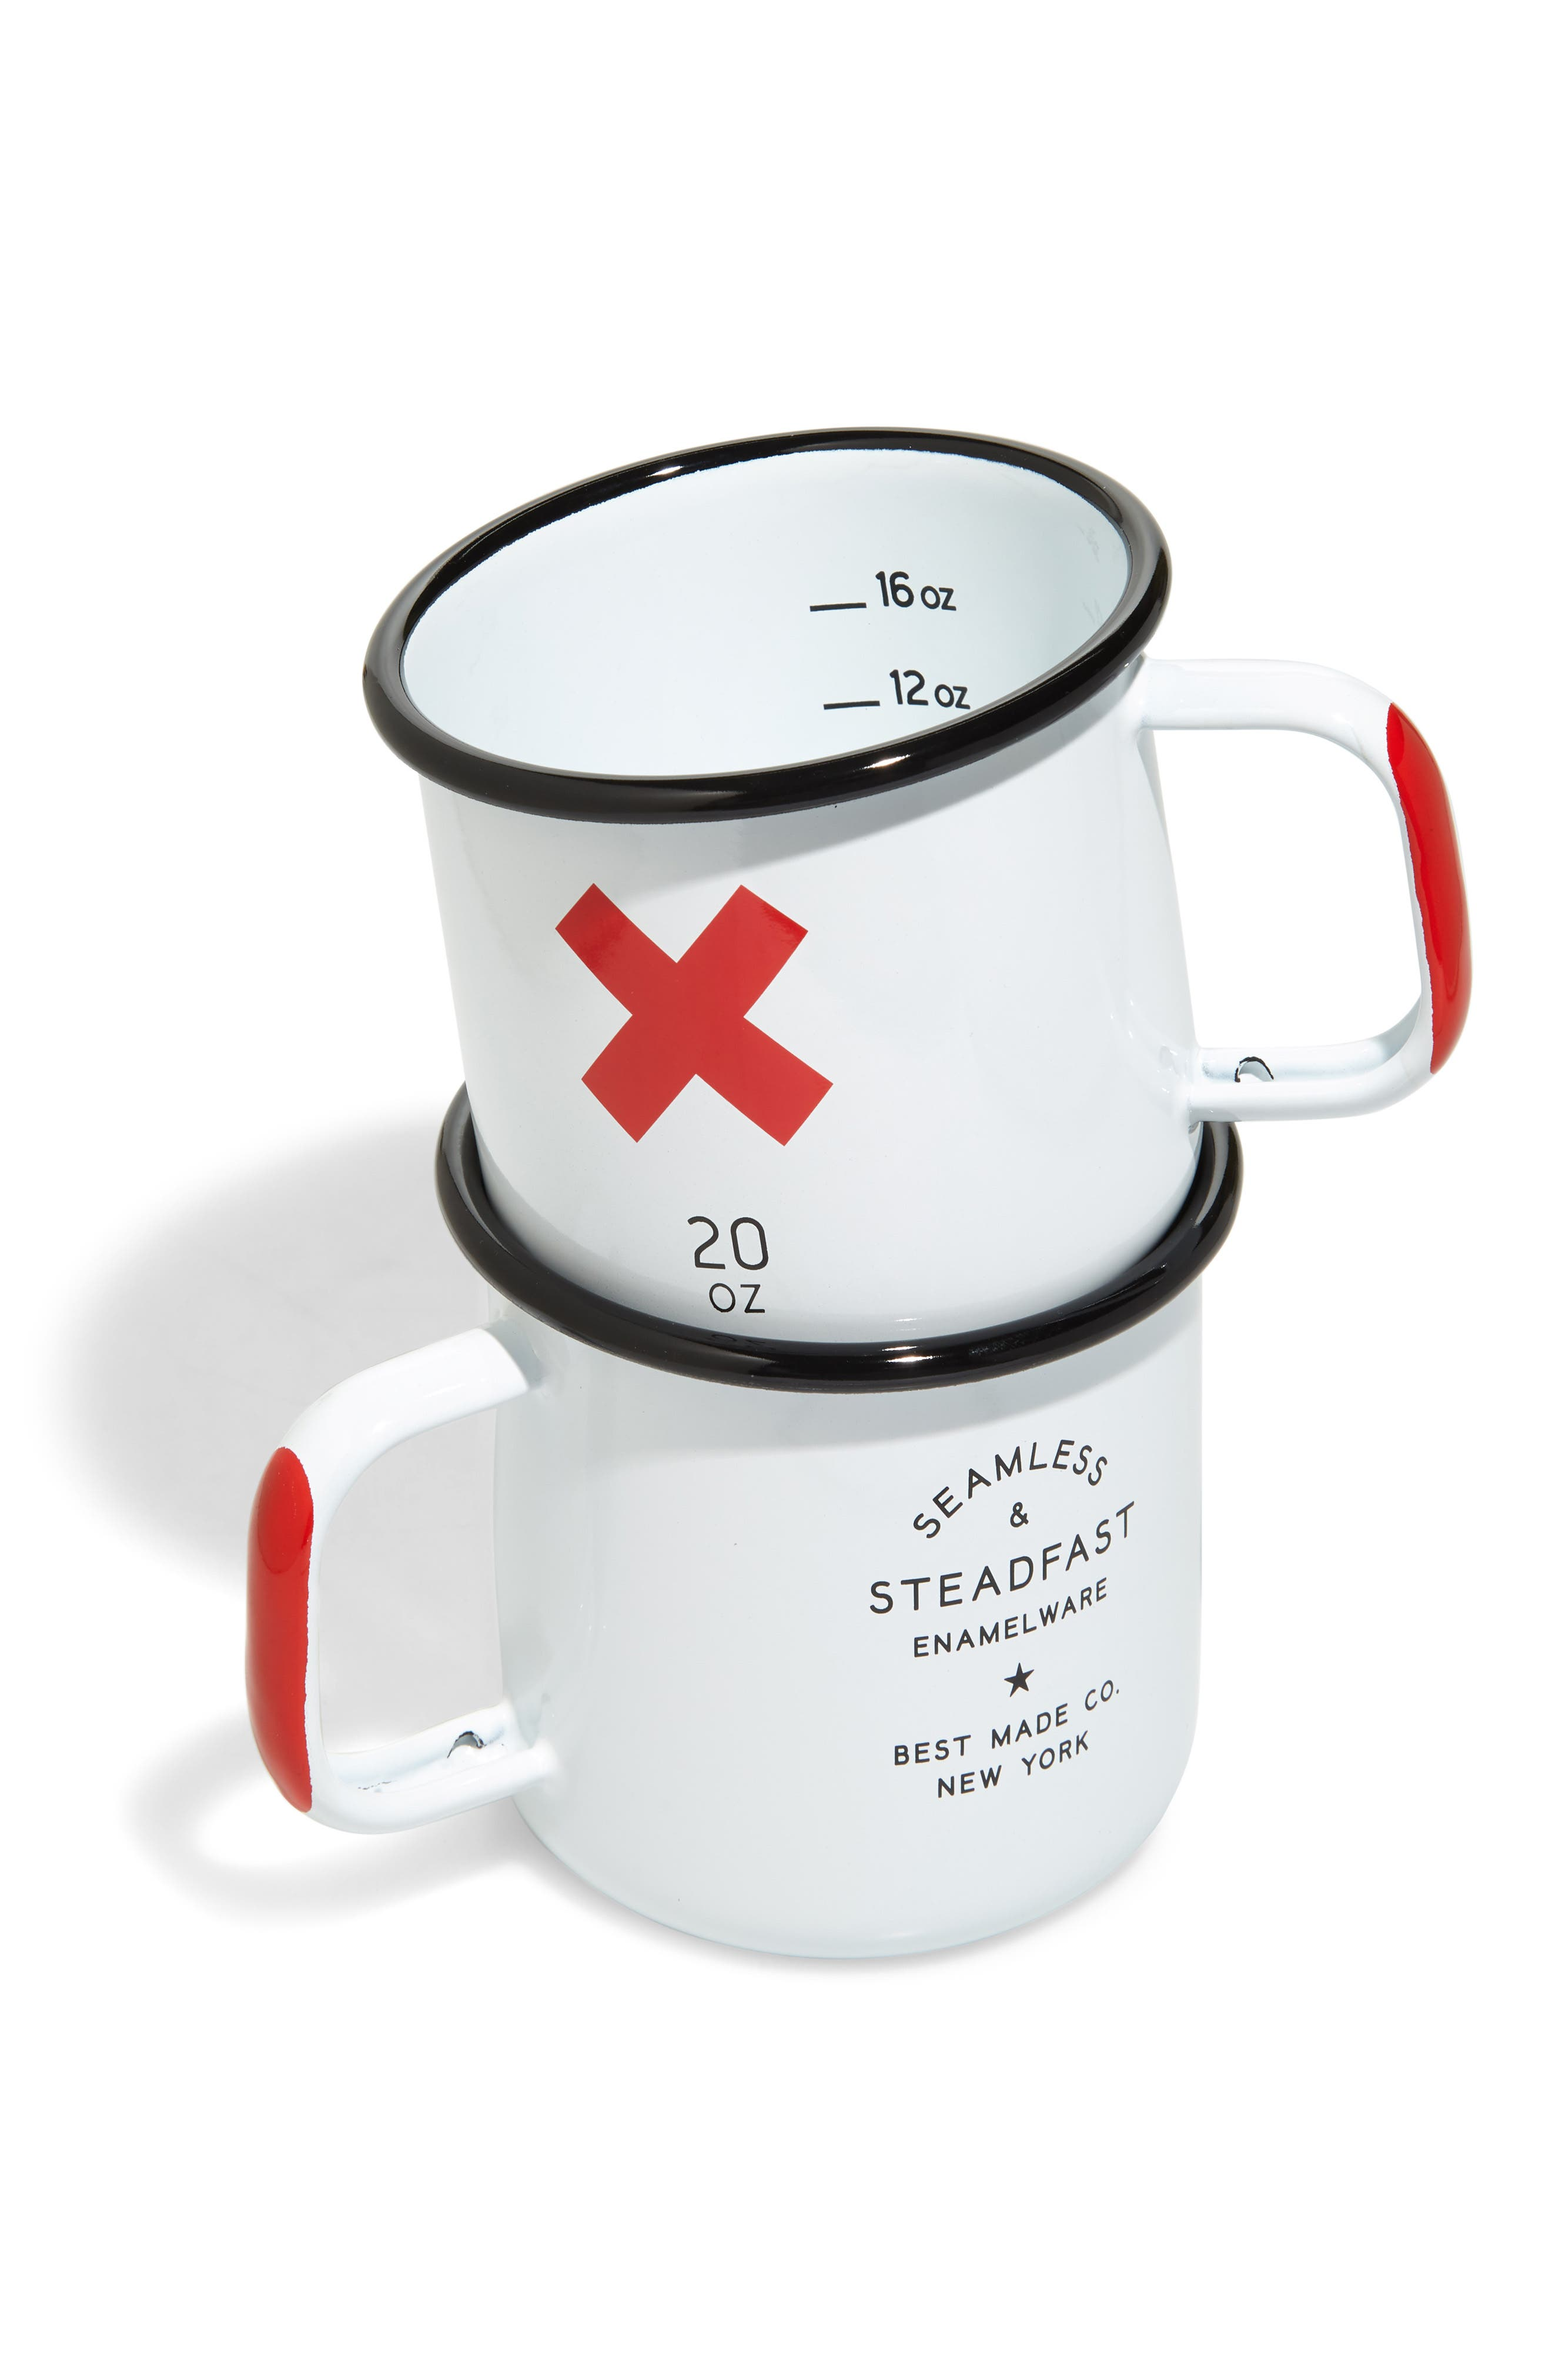 BEST MADE CO.,                             Set of 2 Enameled Steel Mugs,                             Main thumbnail 1, color,                             WHITE